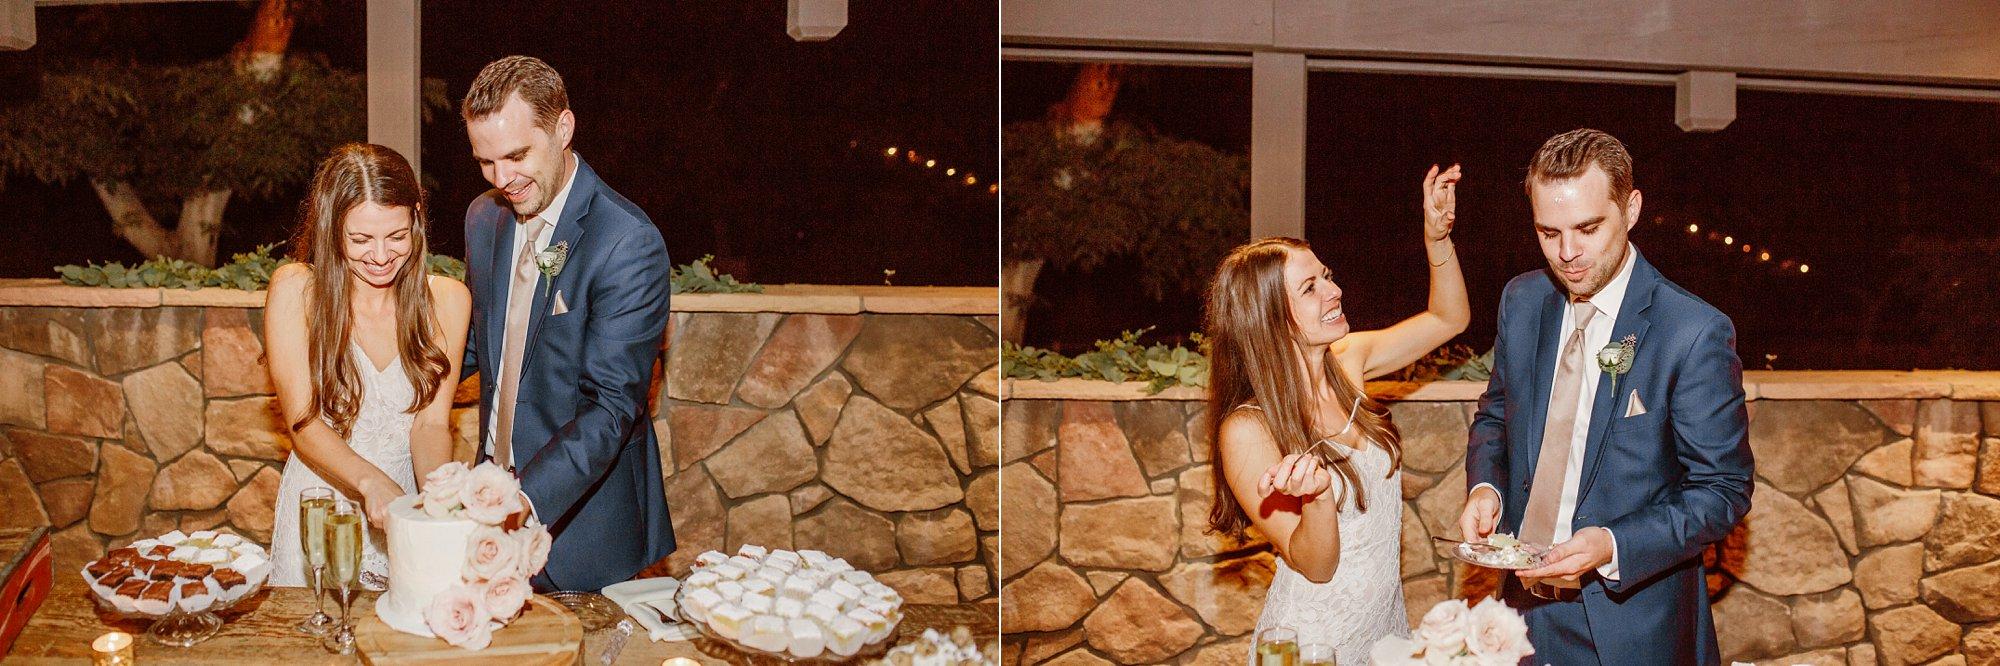 Walnut Grove Moorpark California Wedding_0089.jpg